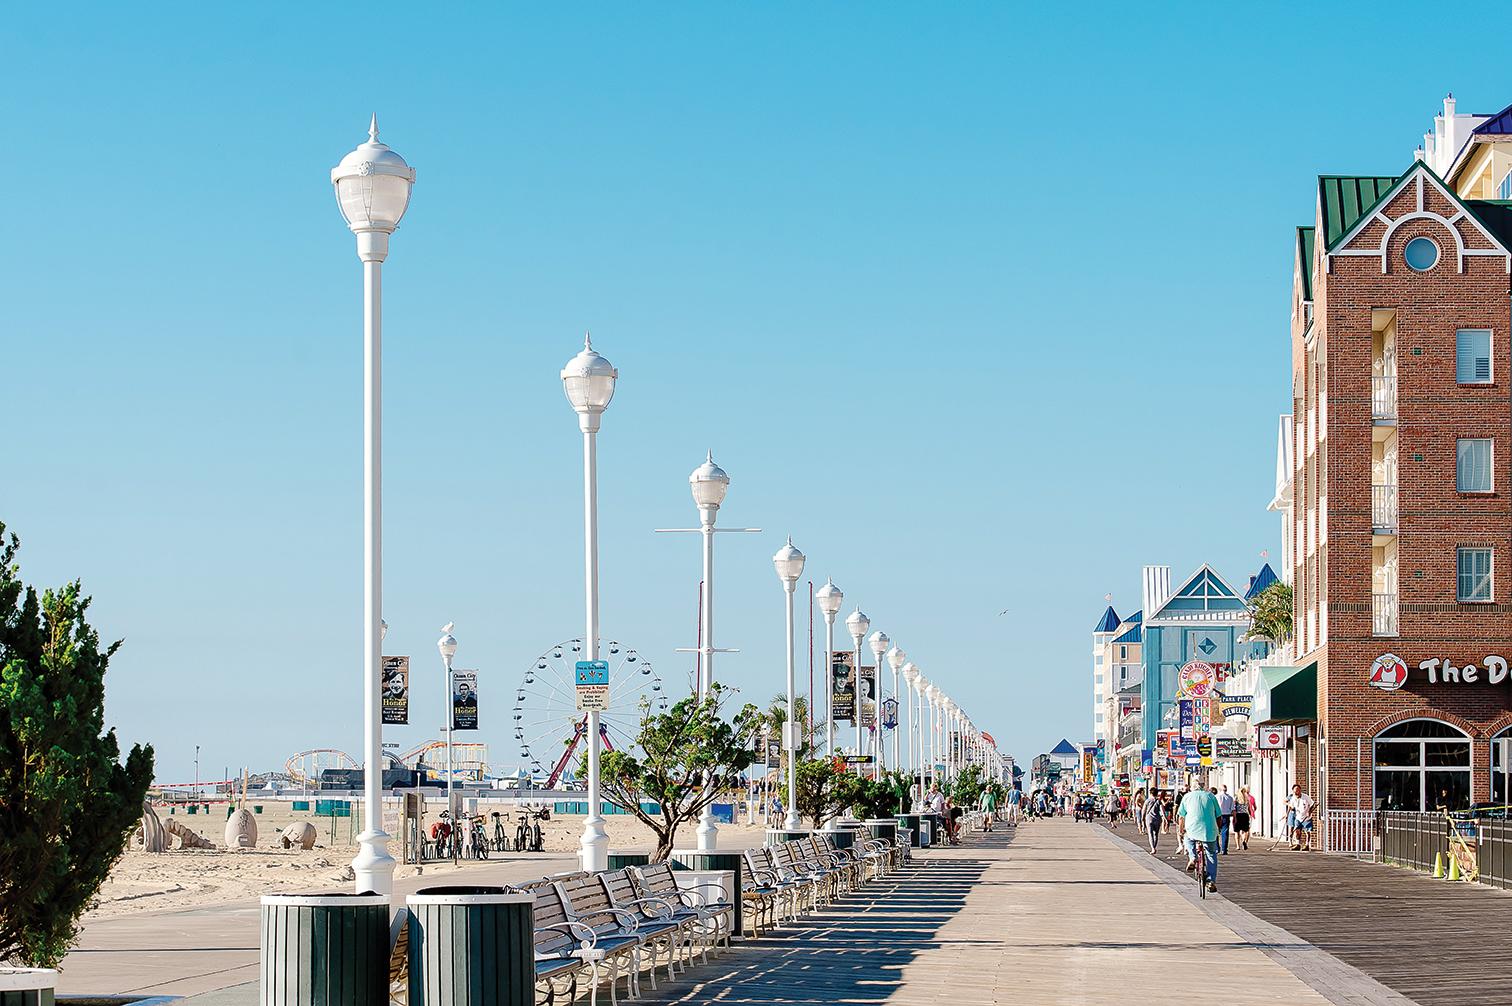 Ocean City Maryland